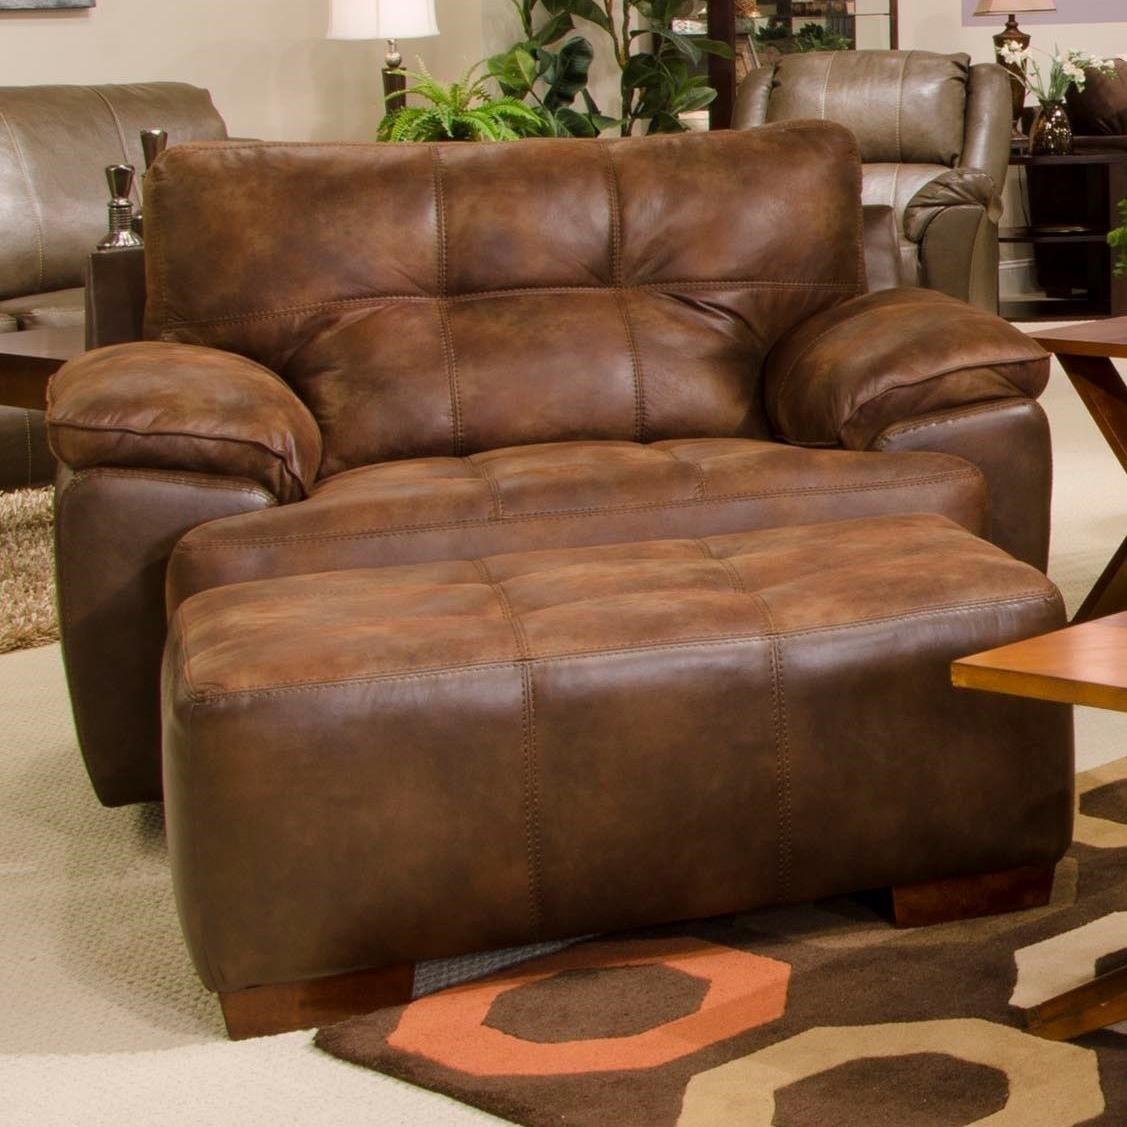 Jackson Furniture Drummond Chair And A Half Amp Ottoman